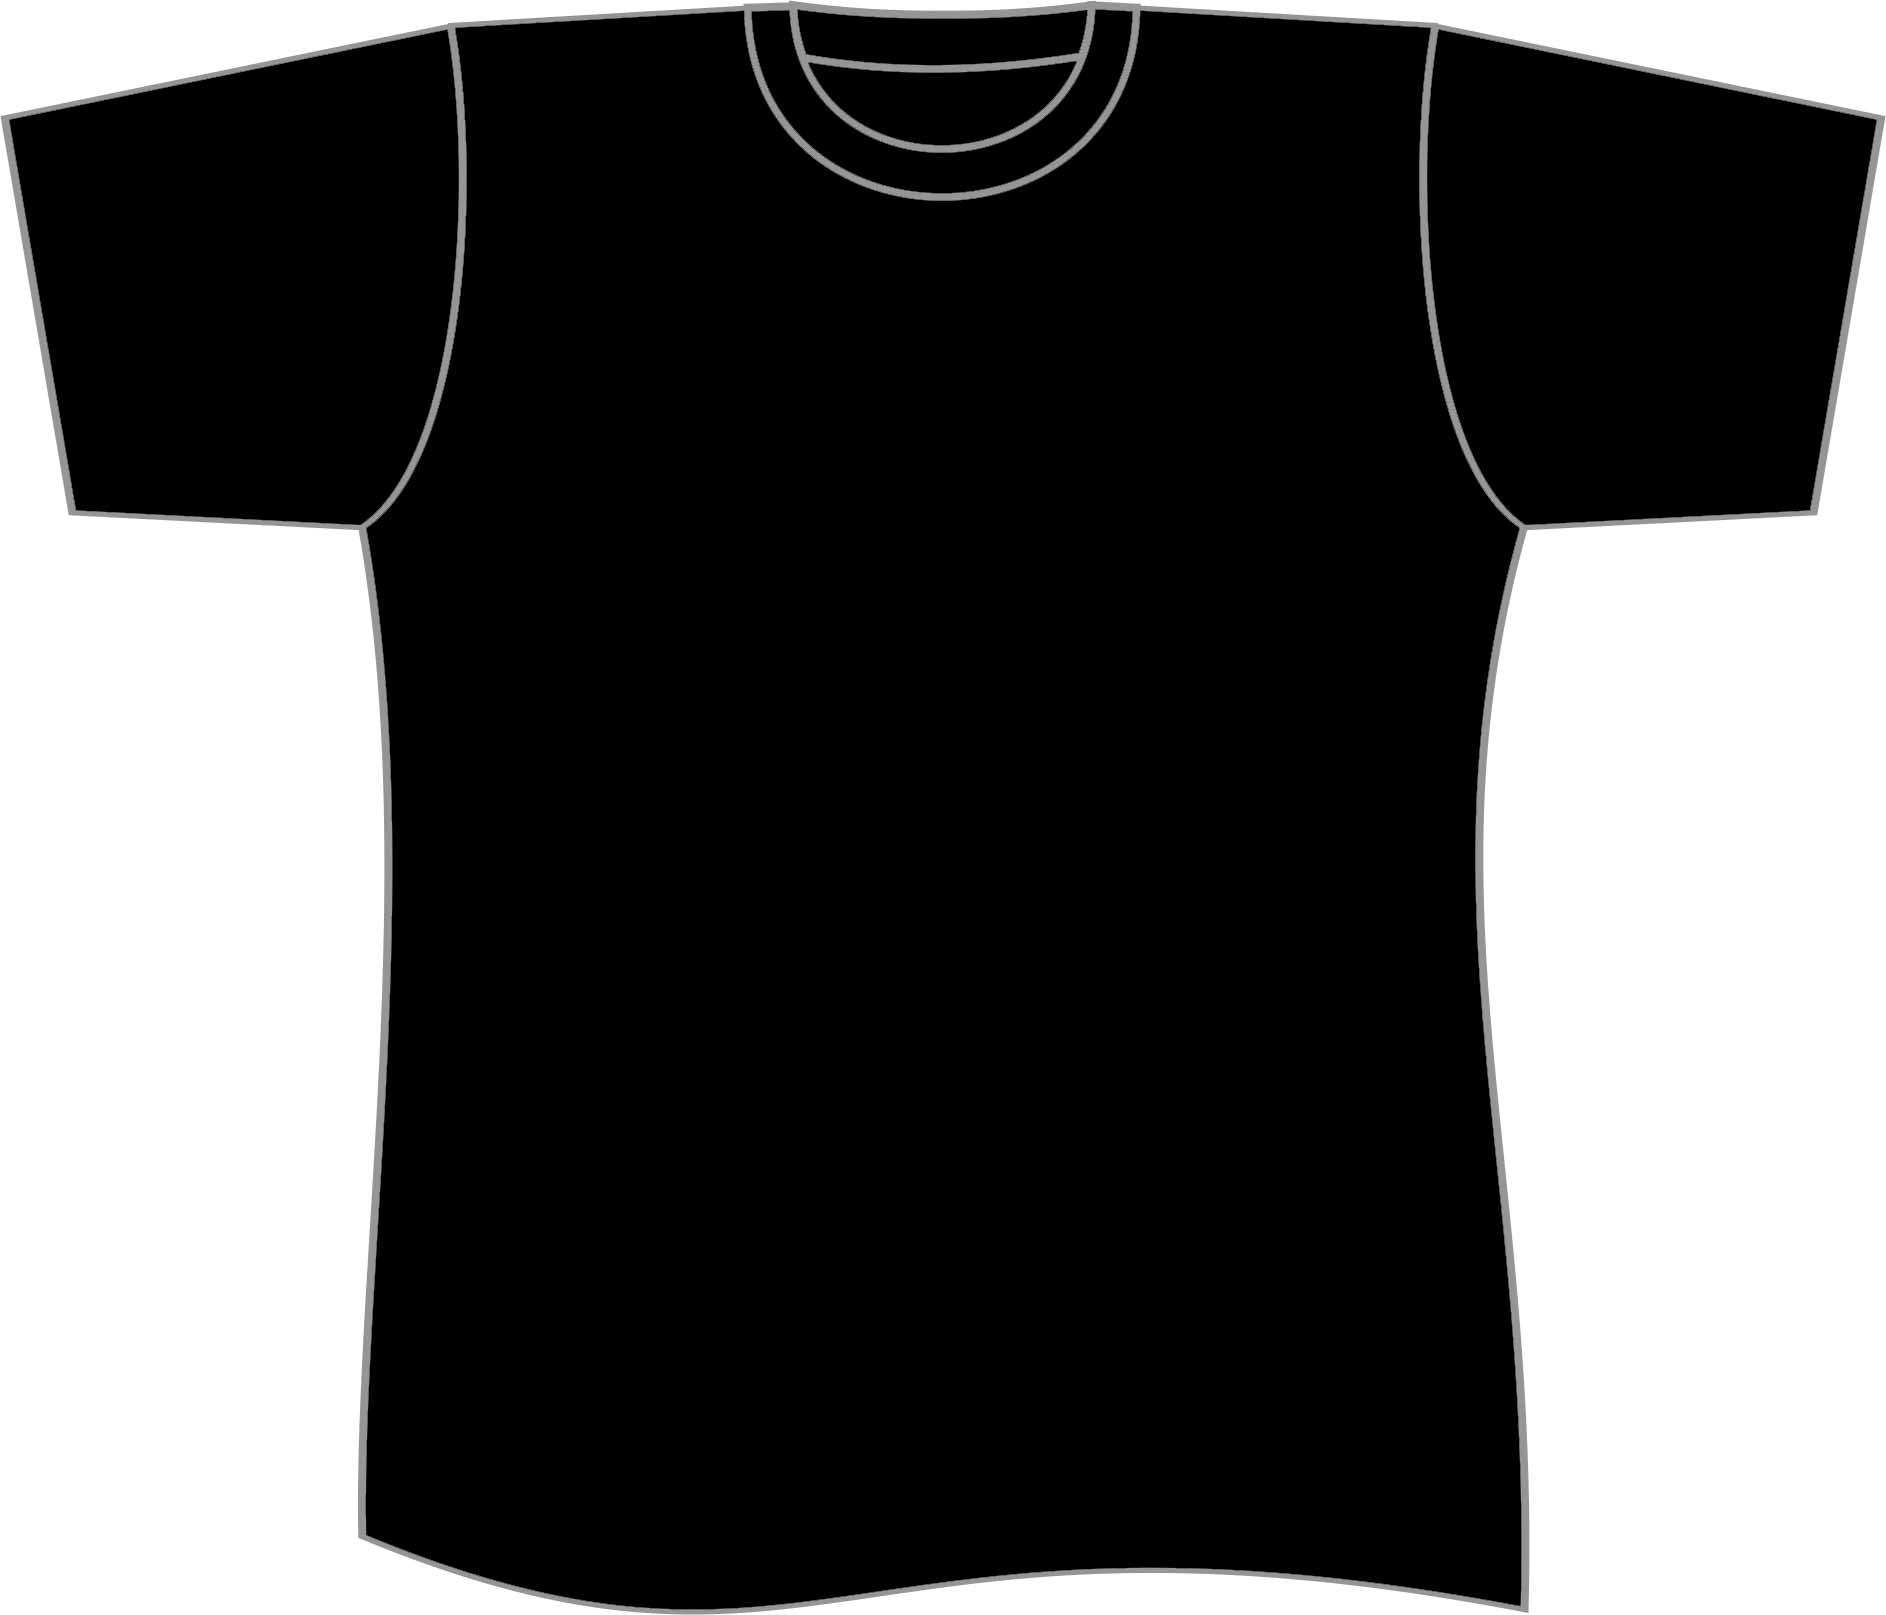 1886x1615 Black T Shirt Clipart